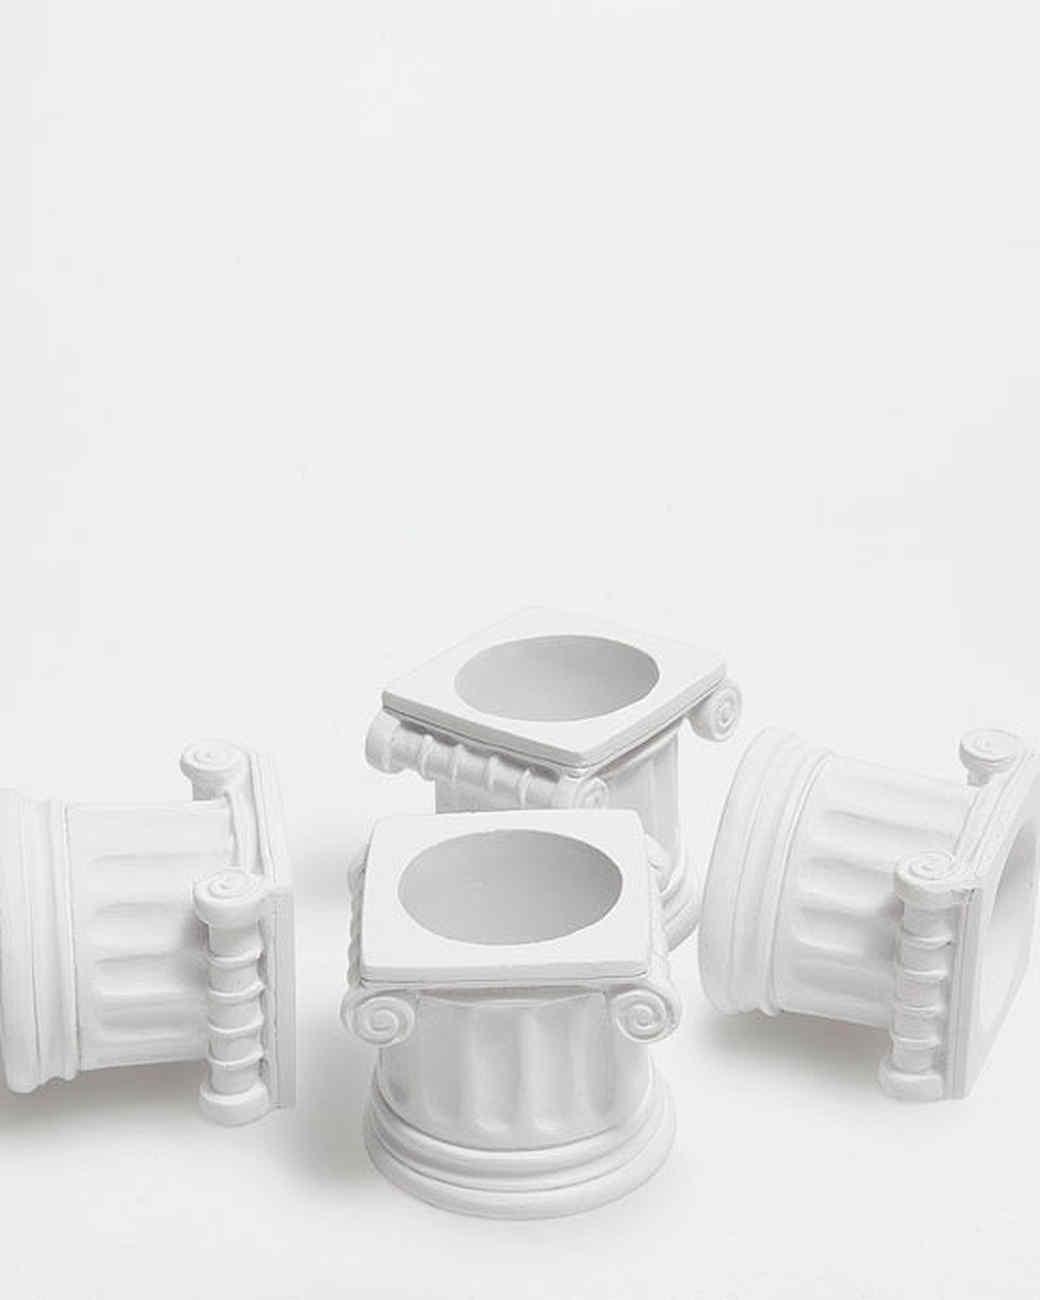 zara-capital-shaped-napkin-ring-set.jpg